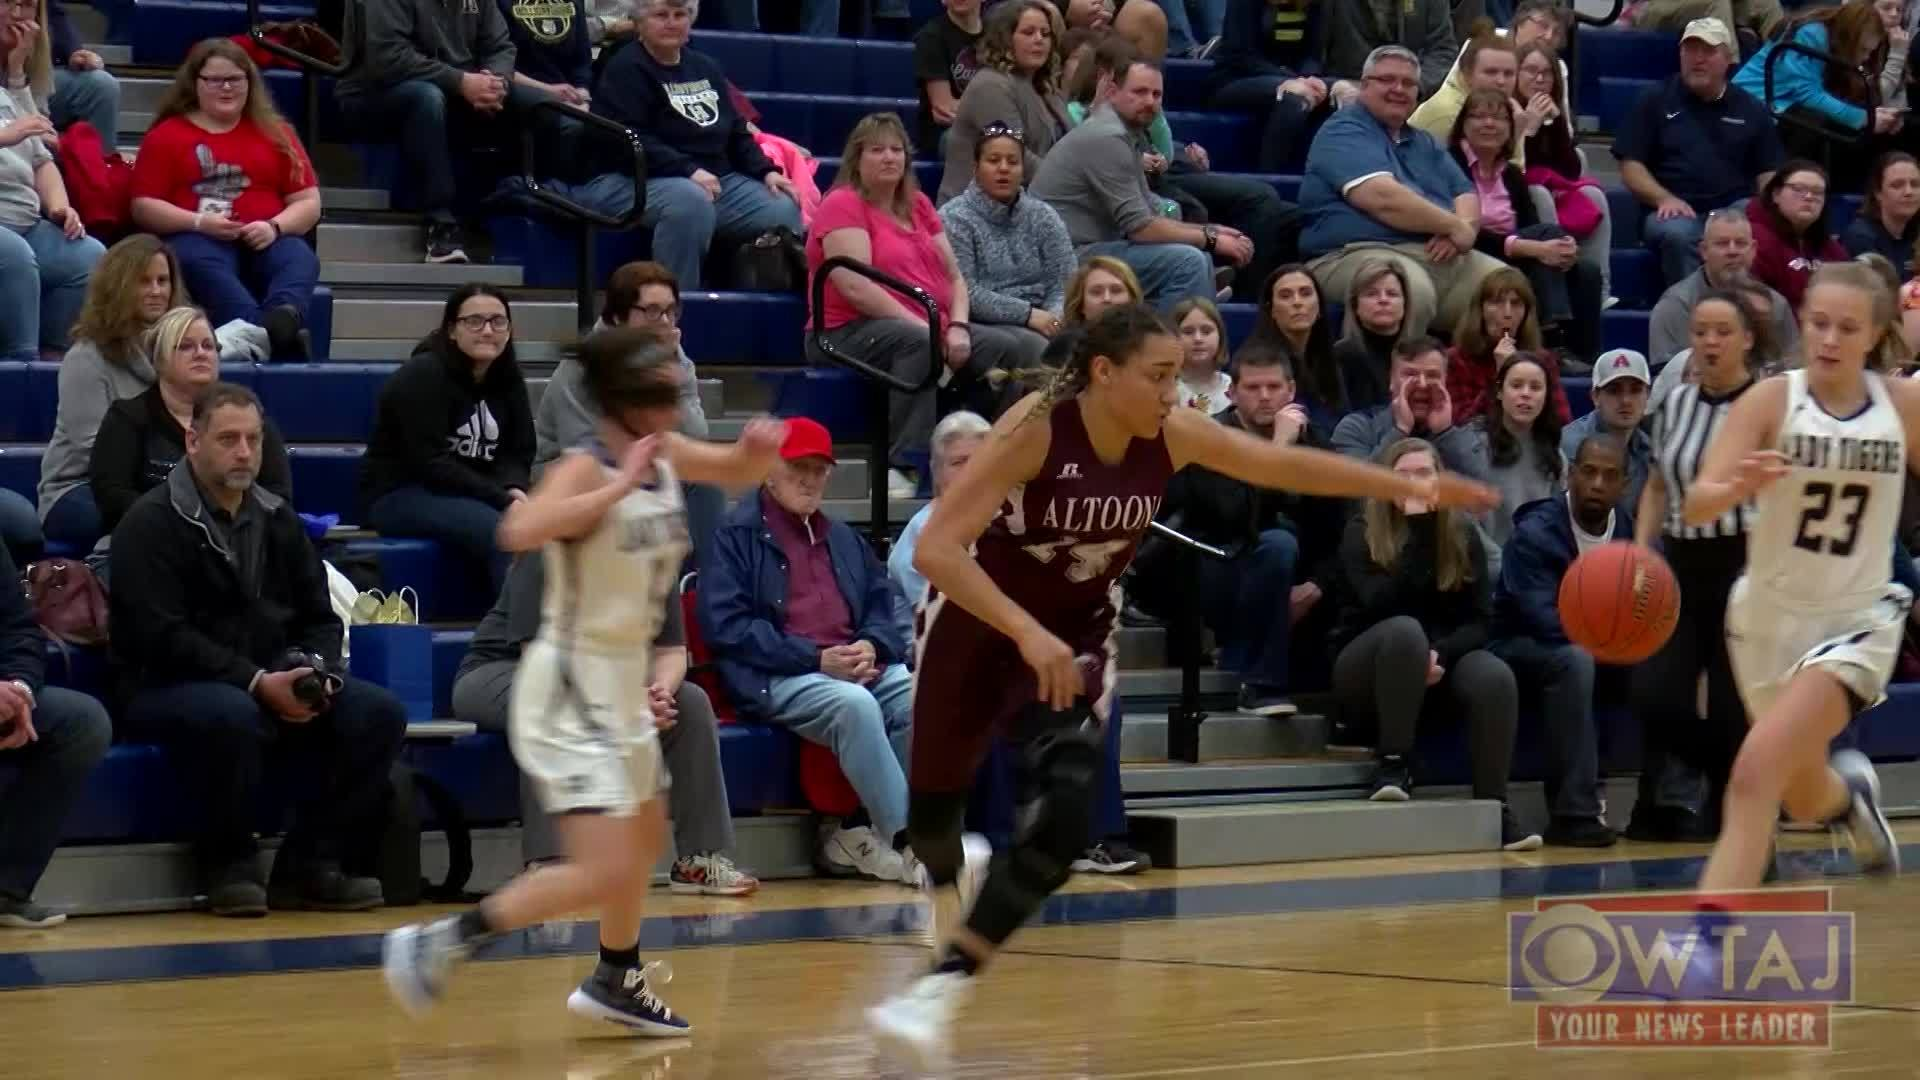 EXTENDED HIGHLIGHTS: Altoona wins 48-44 against Hollidaysburg, Girls Basketball